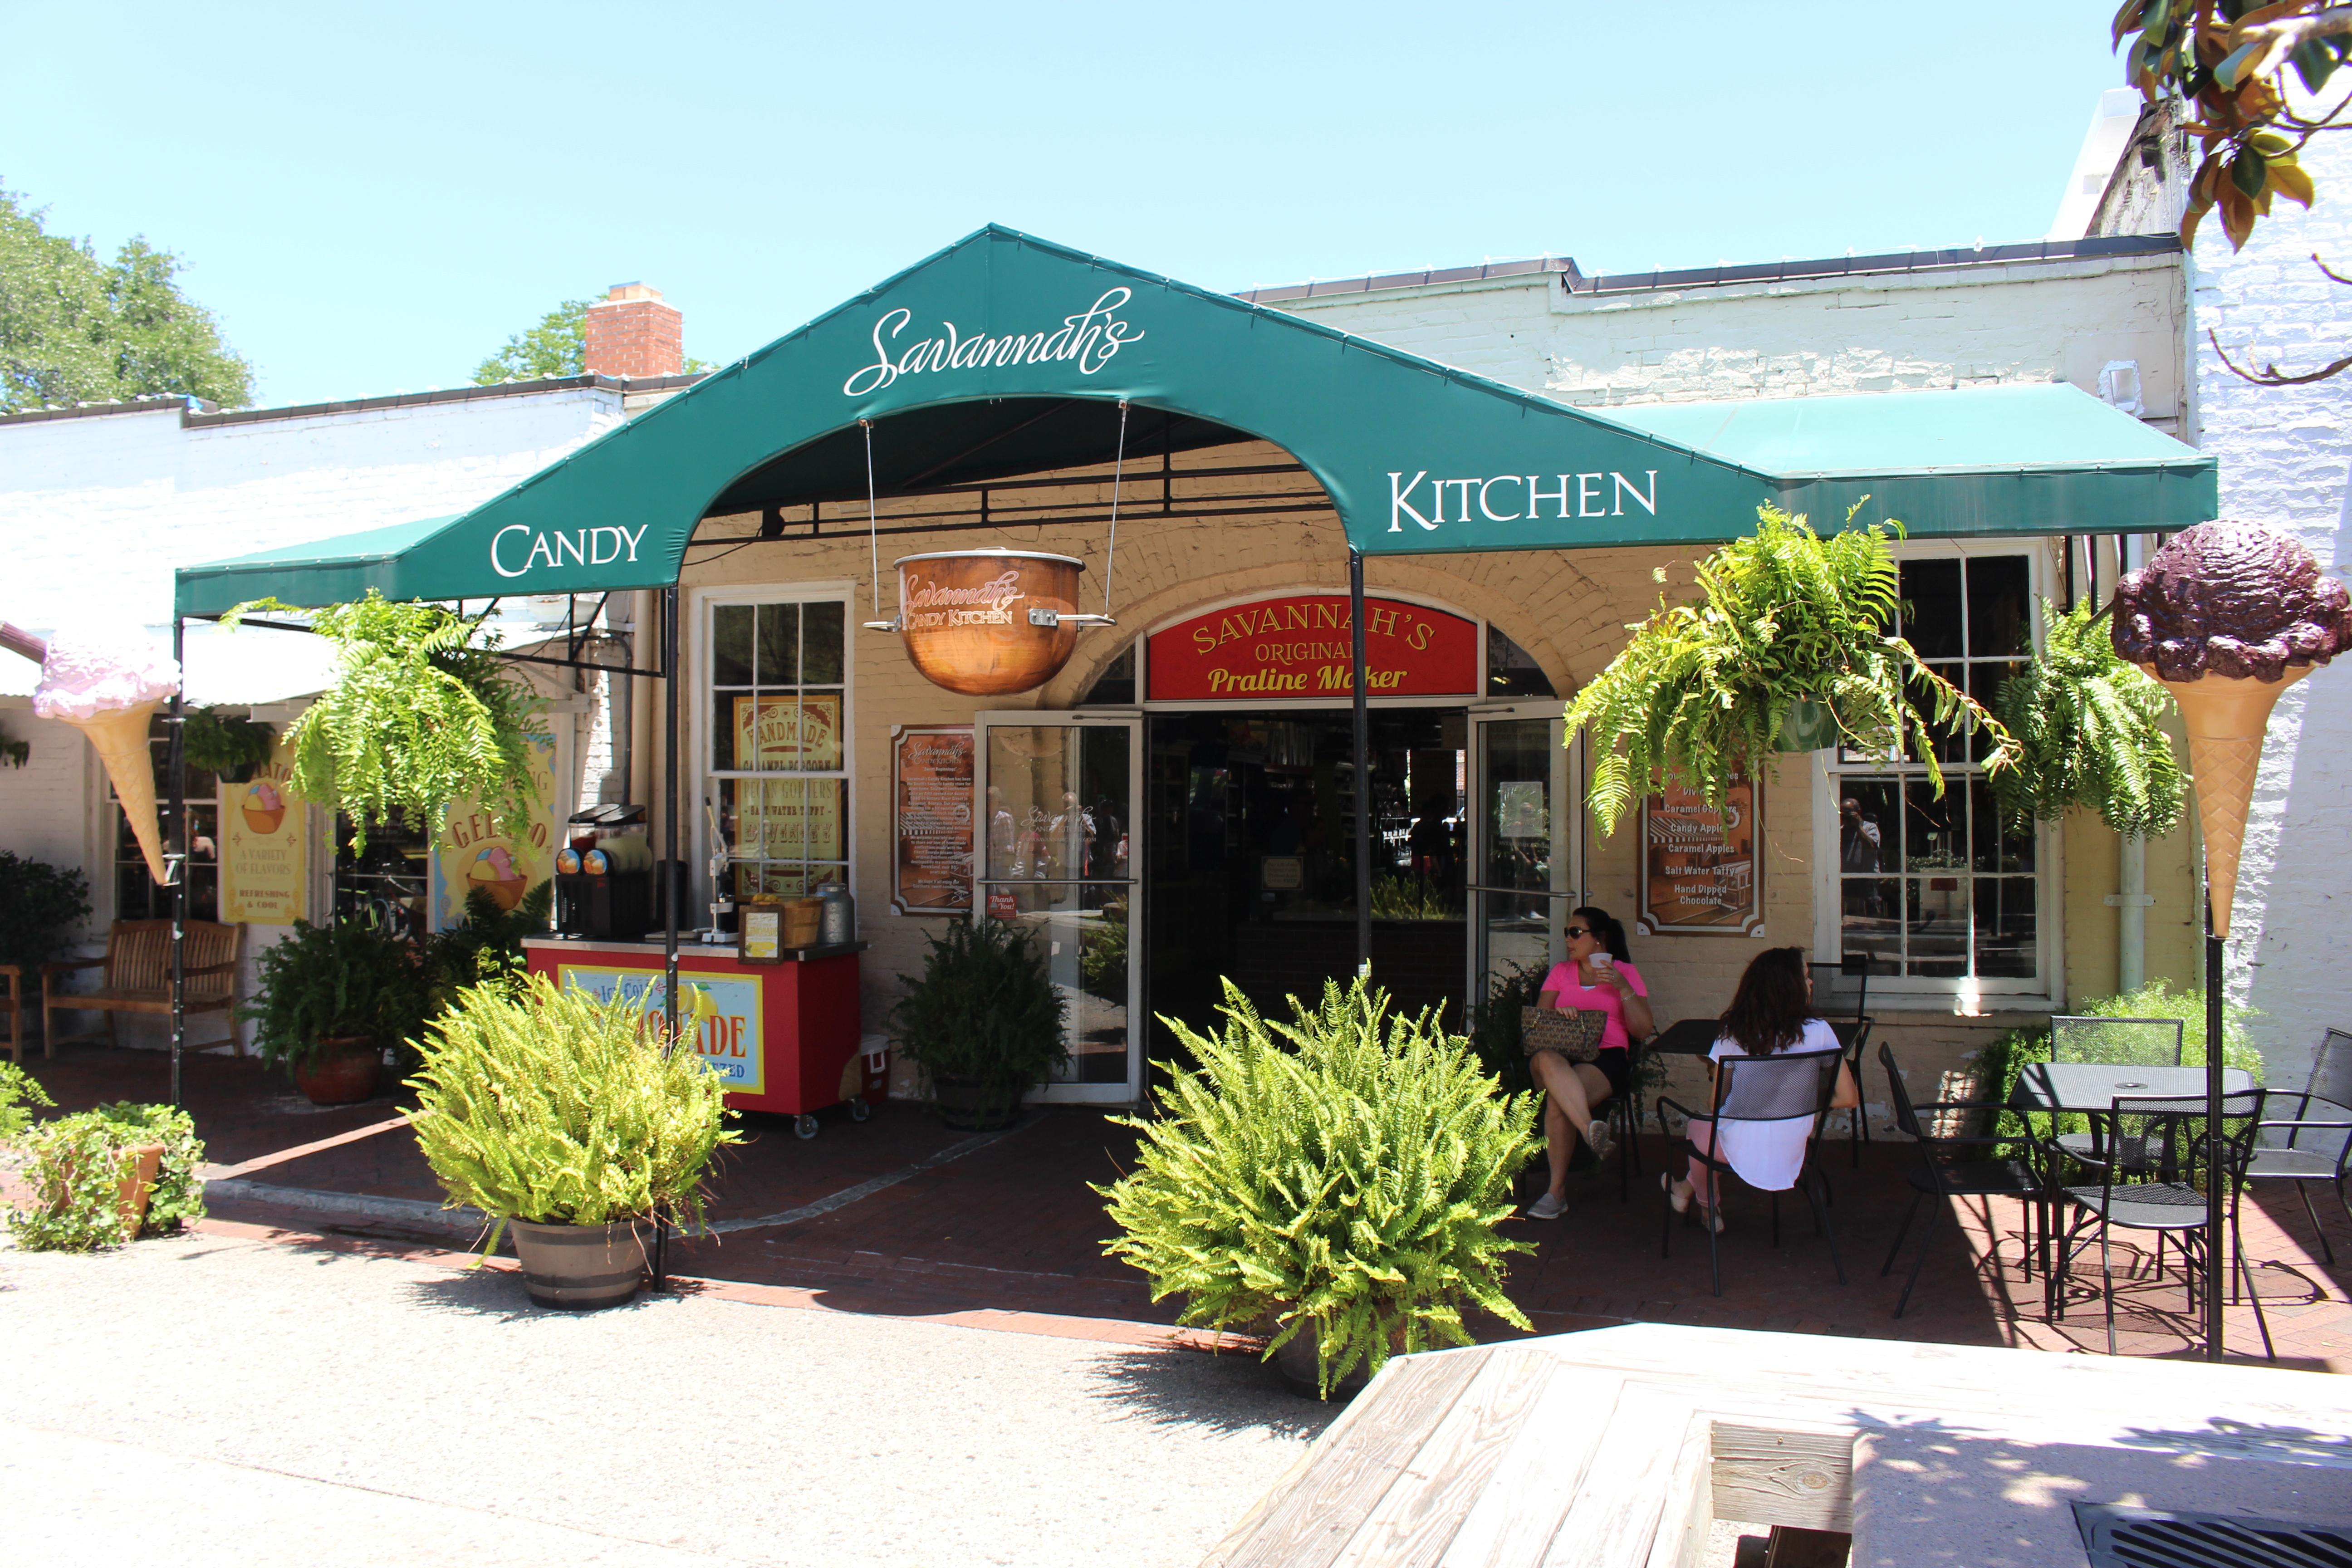 File:Savannah\'s Candy Kitchen.jpg - Wikimedia Commons